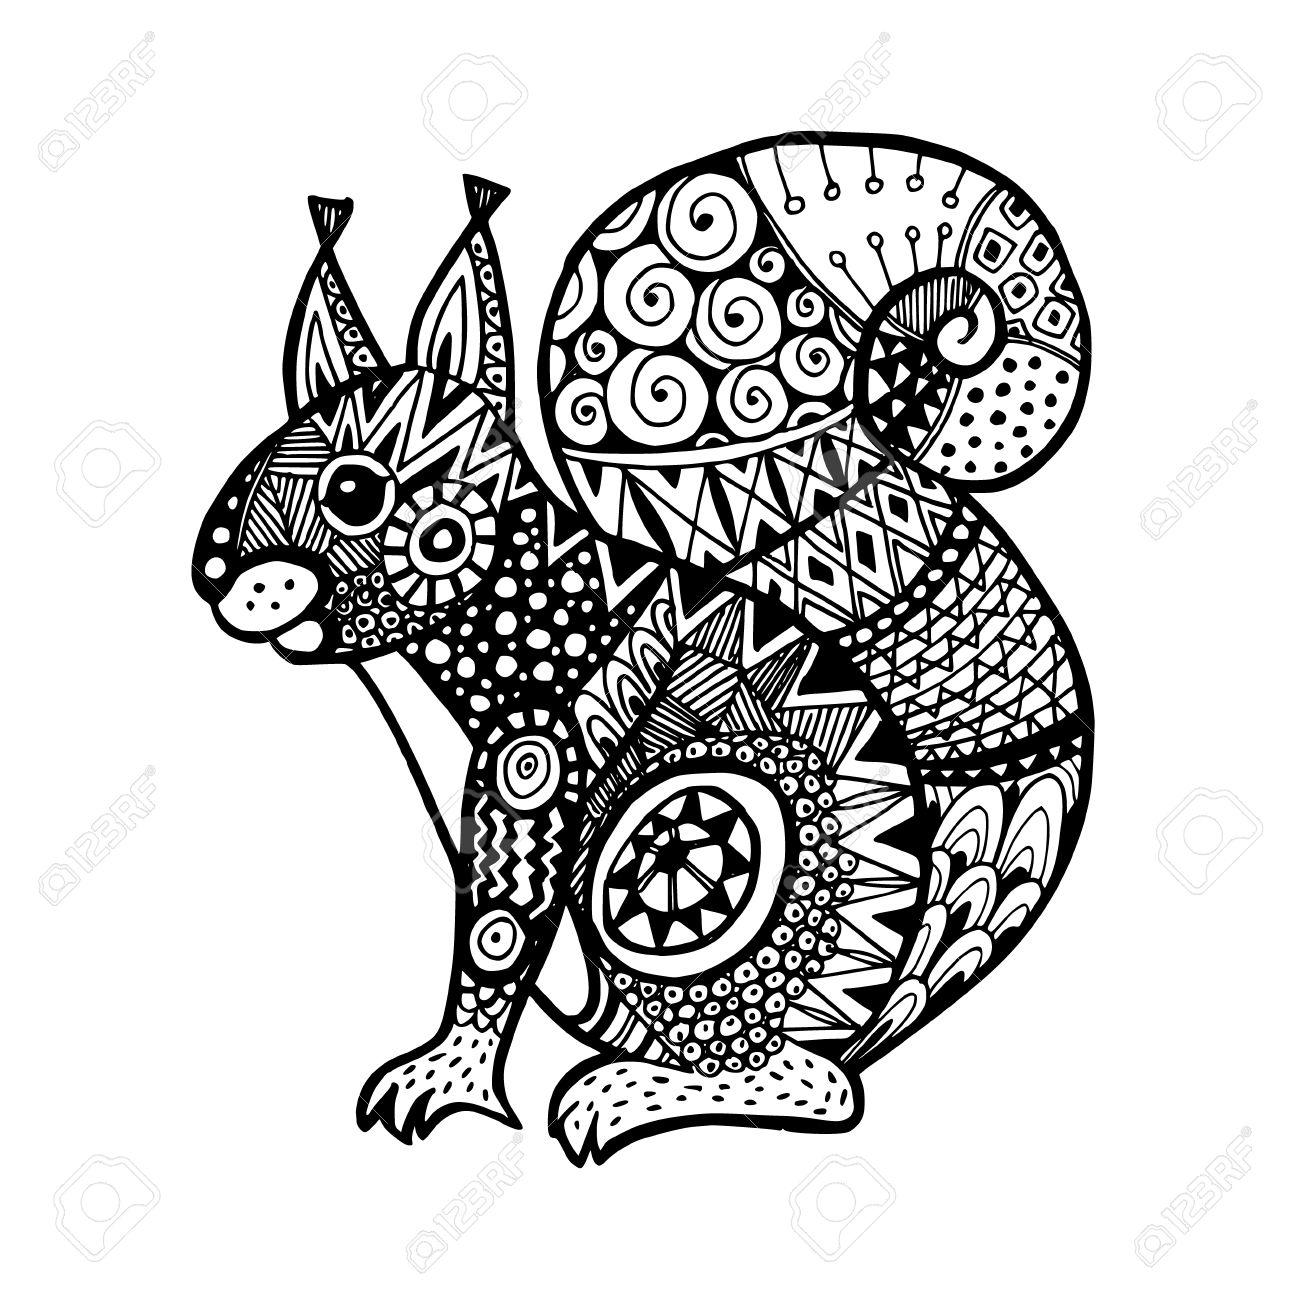 Ornamental Squirrel Trendy Ethnic Zentangle Design Hand Drawn Isolated Vector Illustration Stock